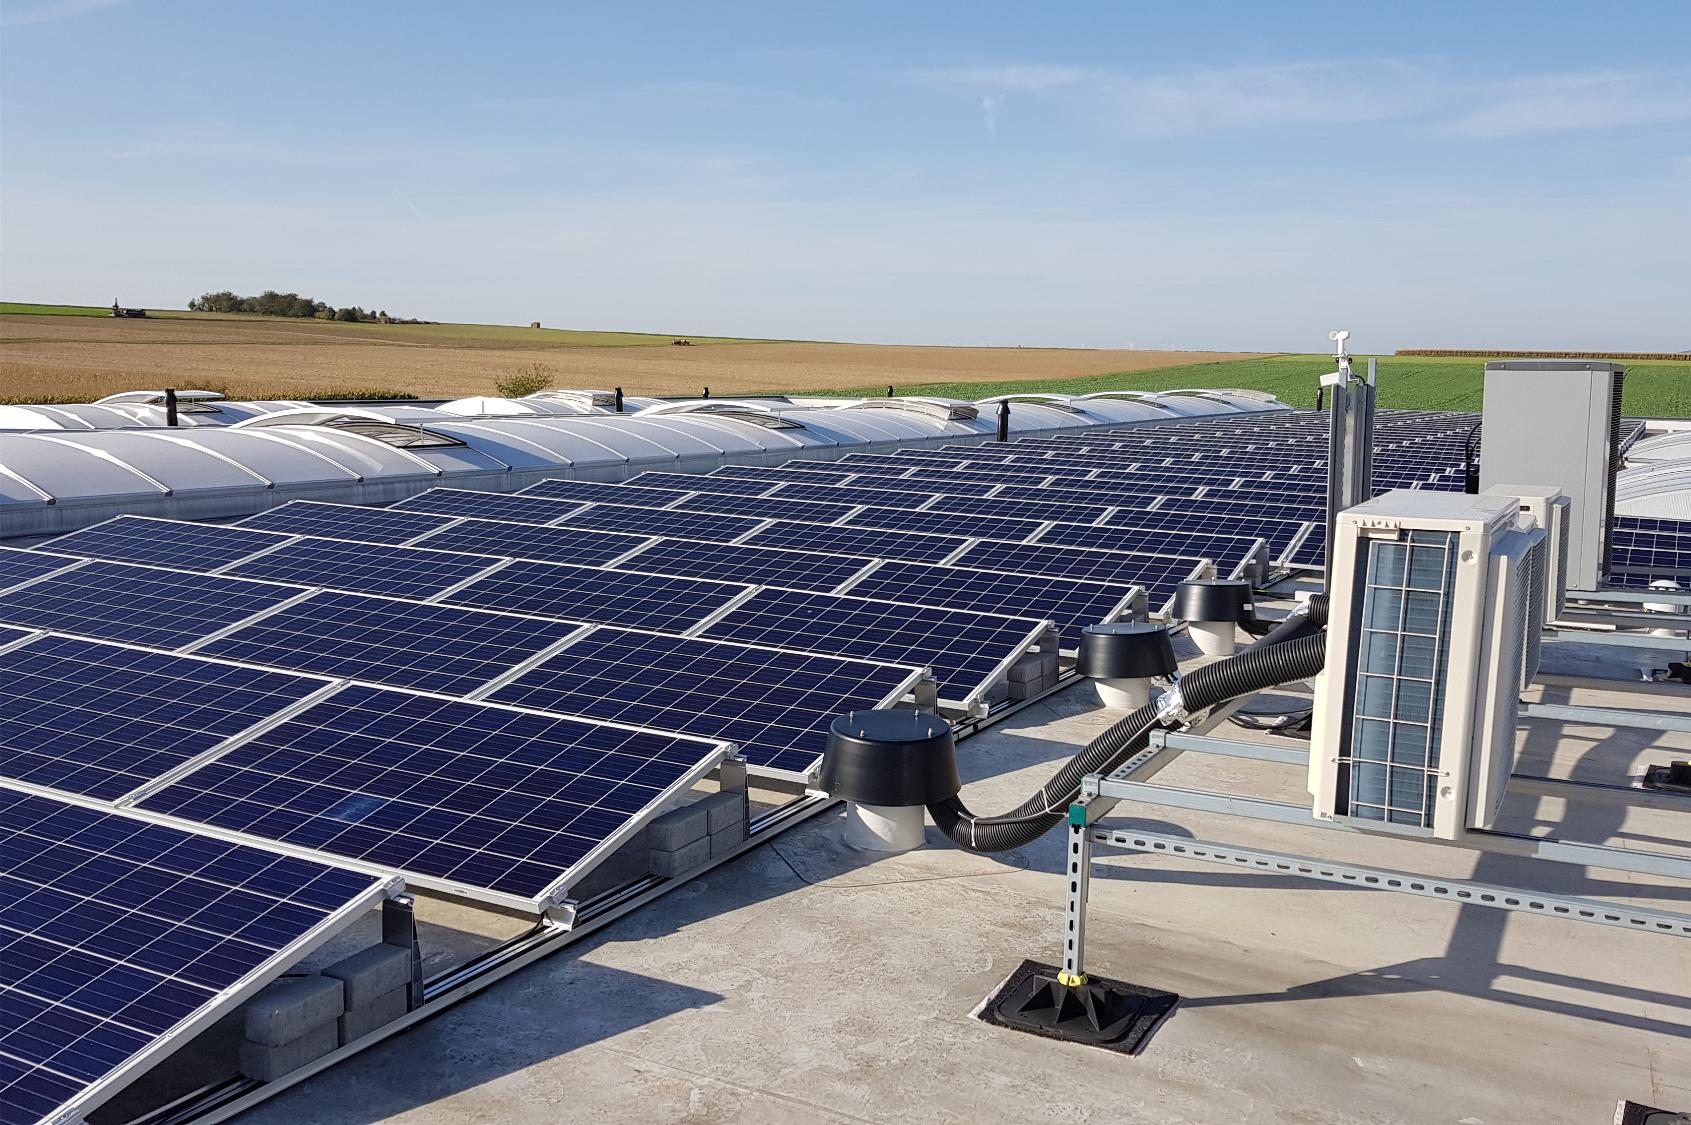 Photovoltaikanlage bei BOIDA - Nachhaltigkeit